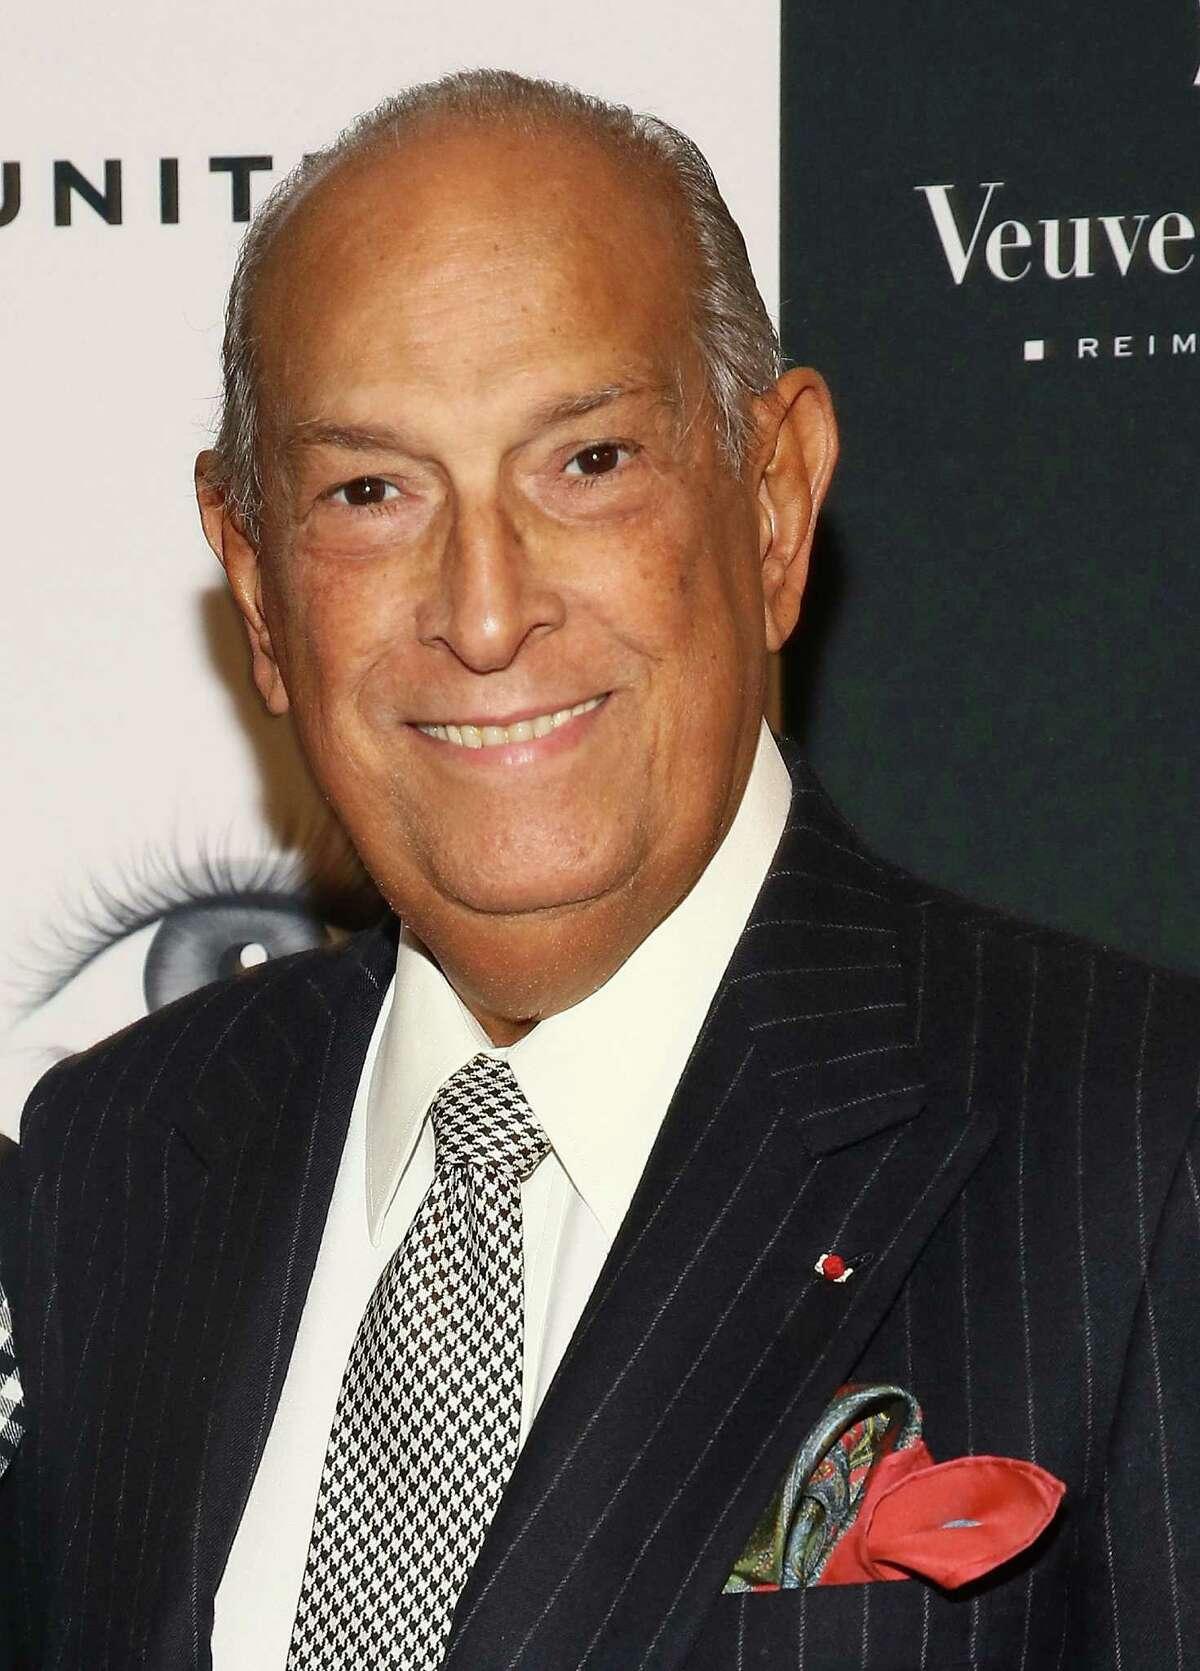 FILE - OCTOBER 20: Fashion designer Oscar De La Renta has died at 82 years old. NEW YORK, NY - SEPTEMBER 19: Oscar de la Renta attends 2013 Icons Of Style Gala at Mandarin Oriental Hotel on September 19, 2013 in New York City.